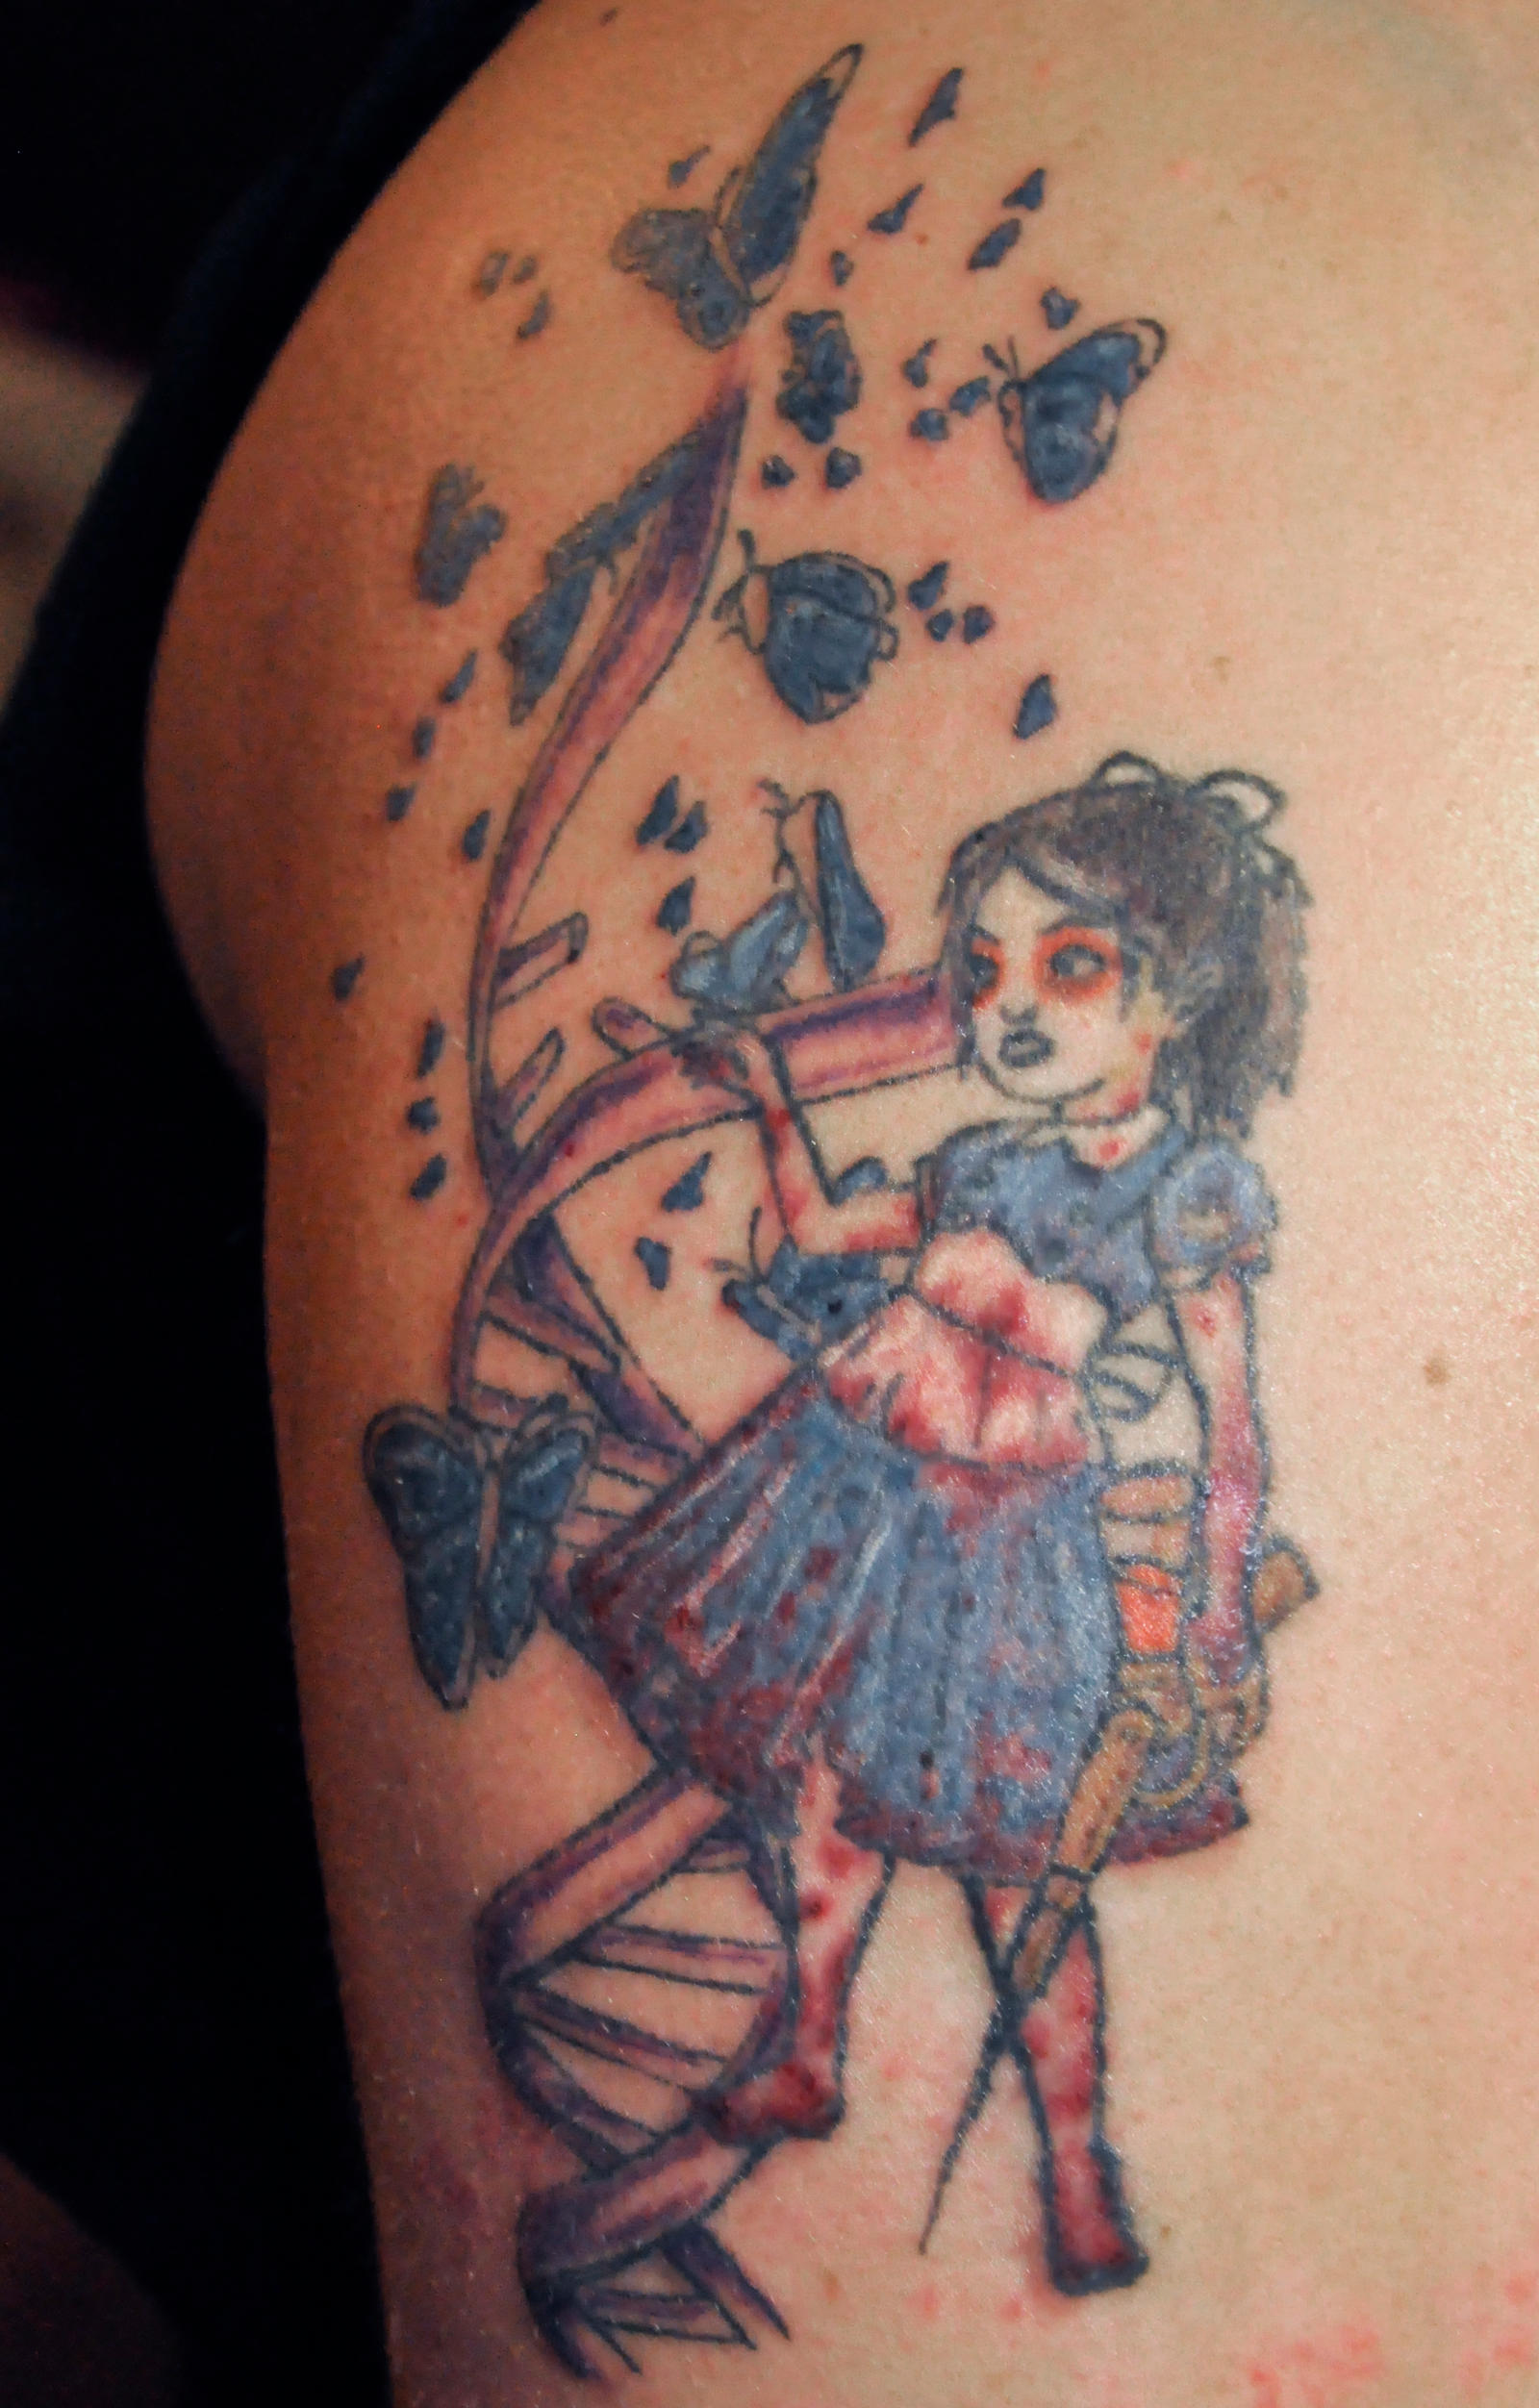 Little Sister Bioshock Tattoo Session 3 By Xenohm On Deviantart